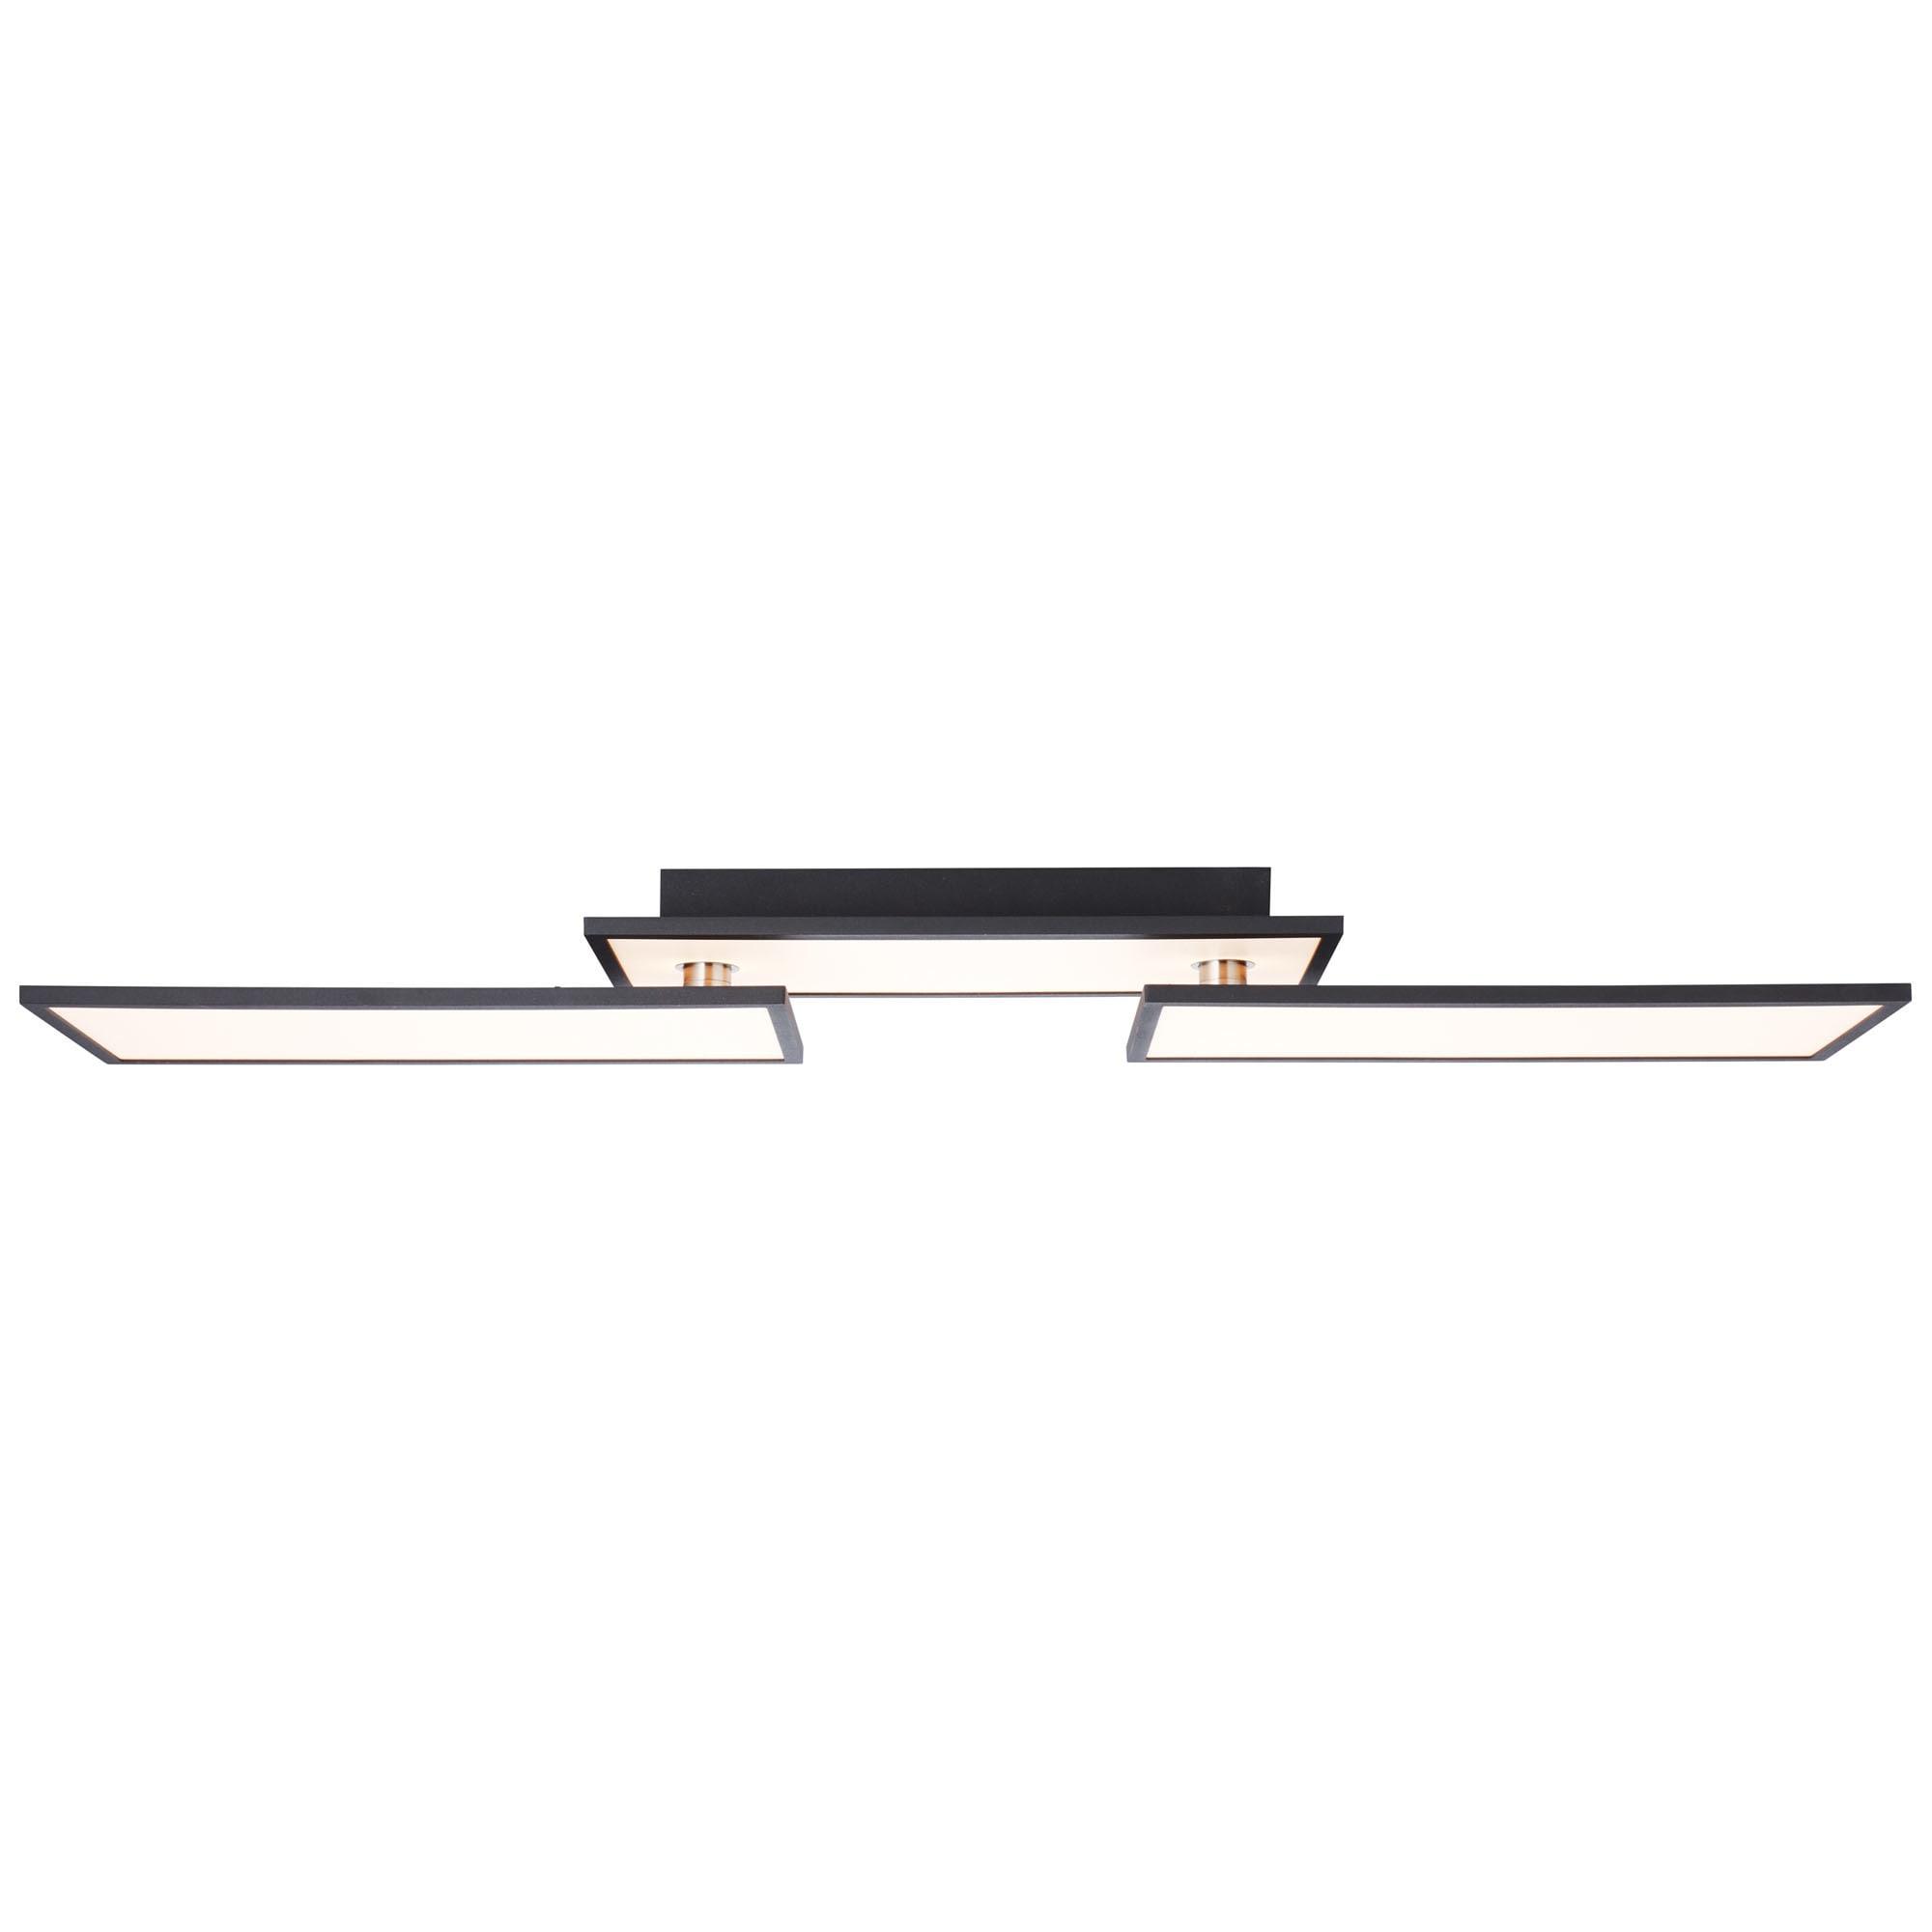 Brilliant Leuchten Bility LED Deckenaufbau-Paneel 110x20cm schwarz/weiÃY easyDim